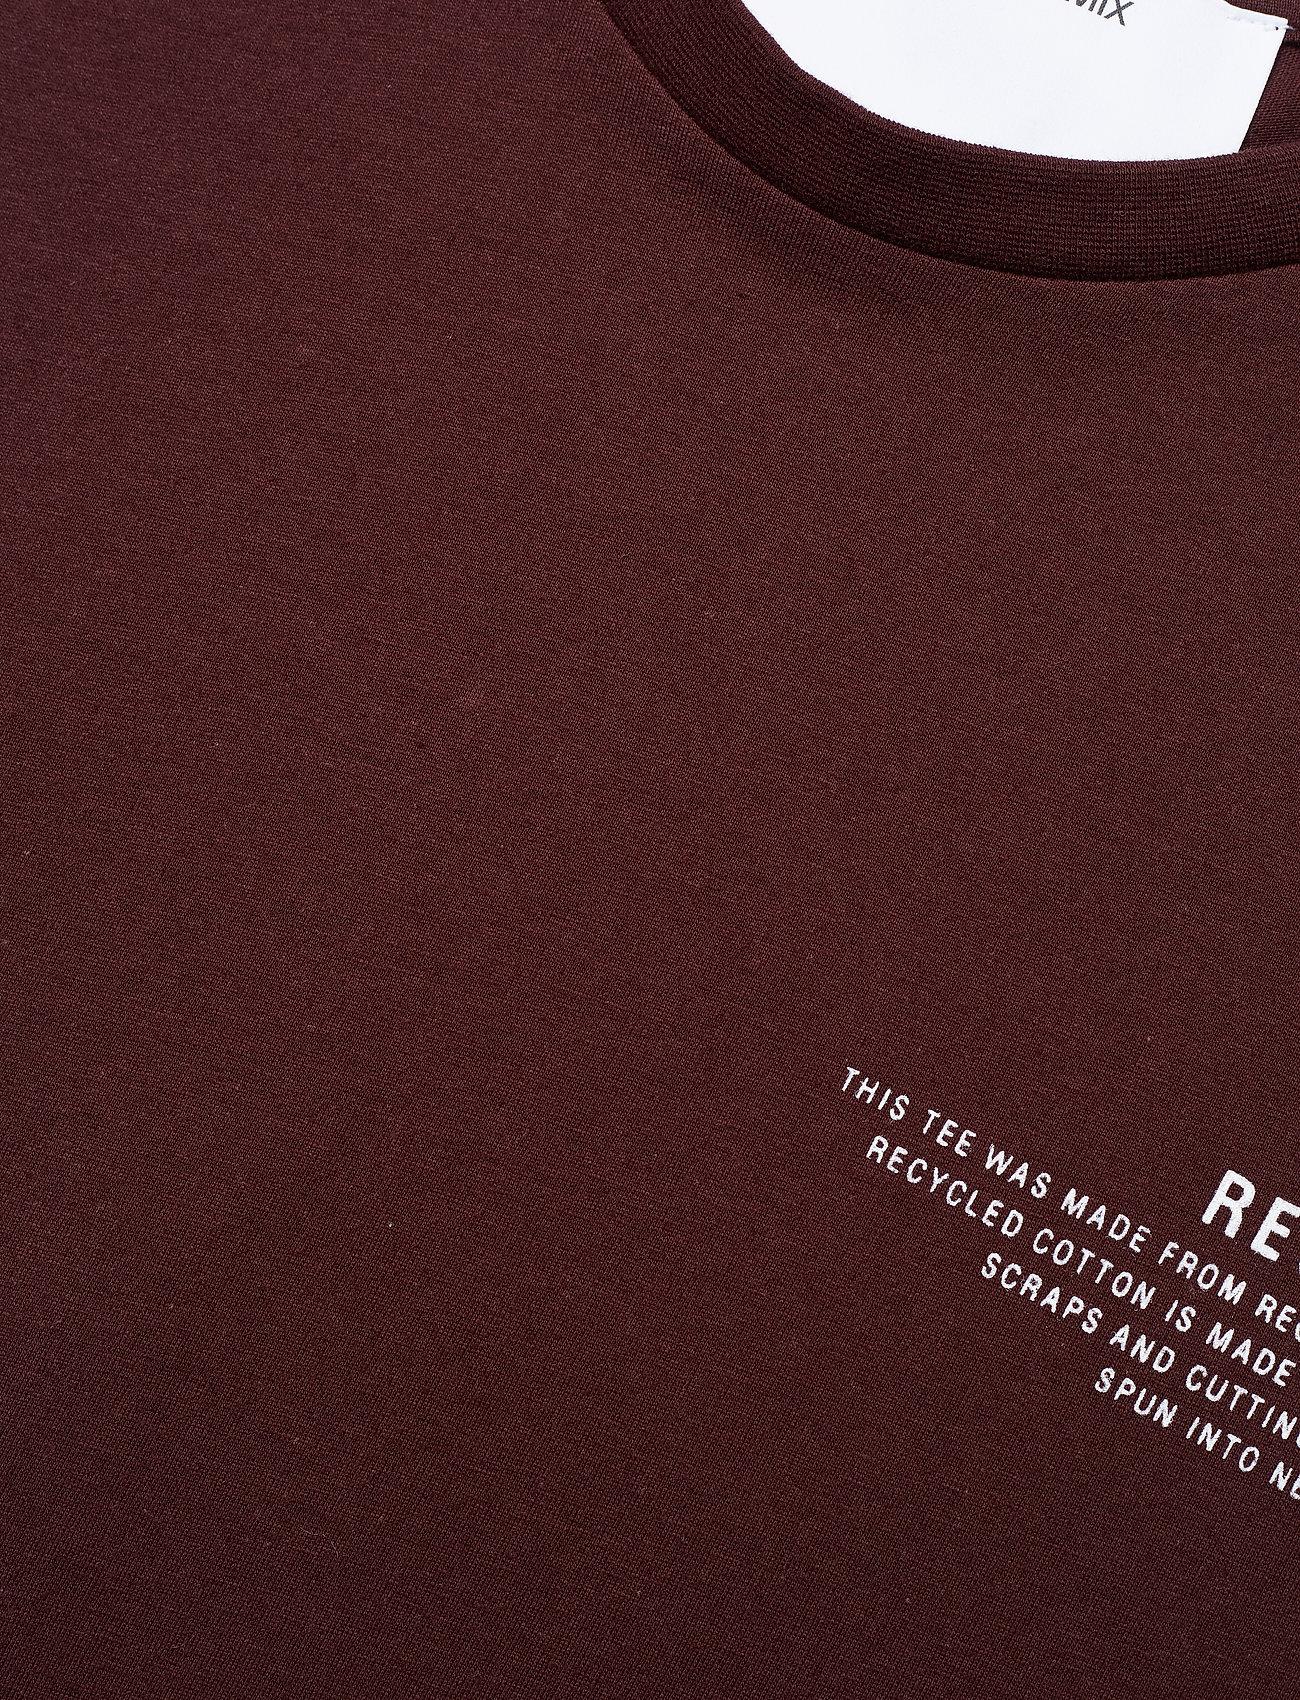 Stanley Text Tee (Rouge Noir) (305.25 kr) - DESIGNERS, REMIX